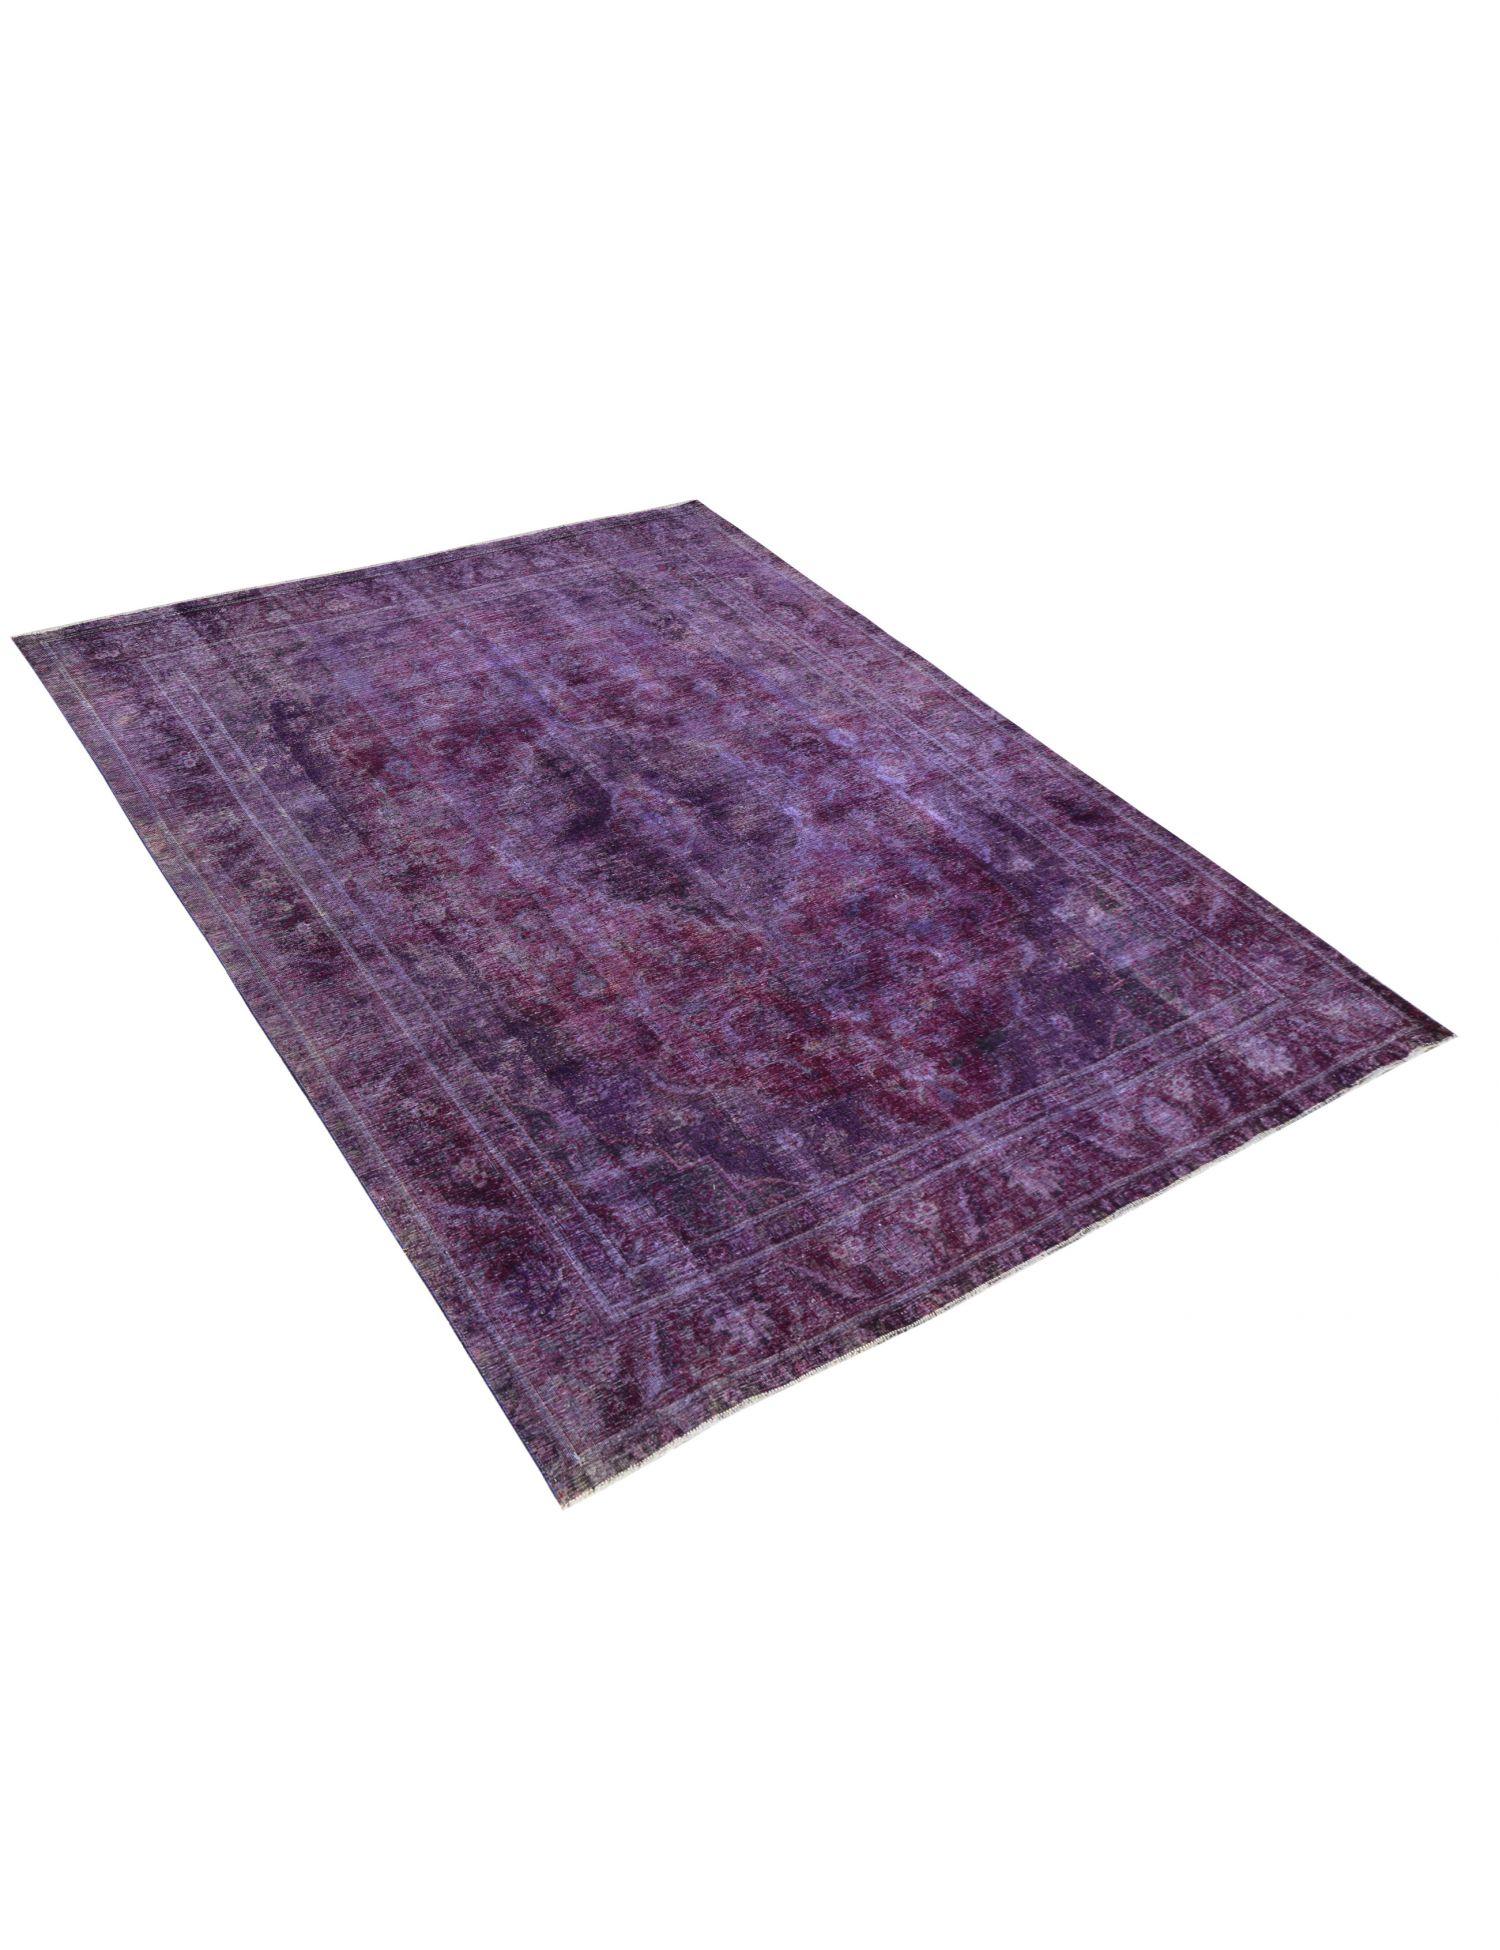 Vintage Carpet  violetti <br/>375 x 288 cm